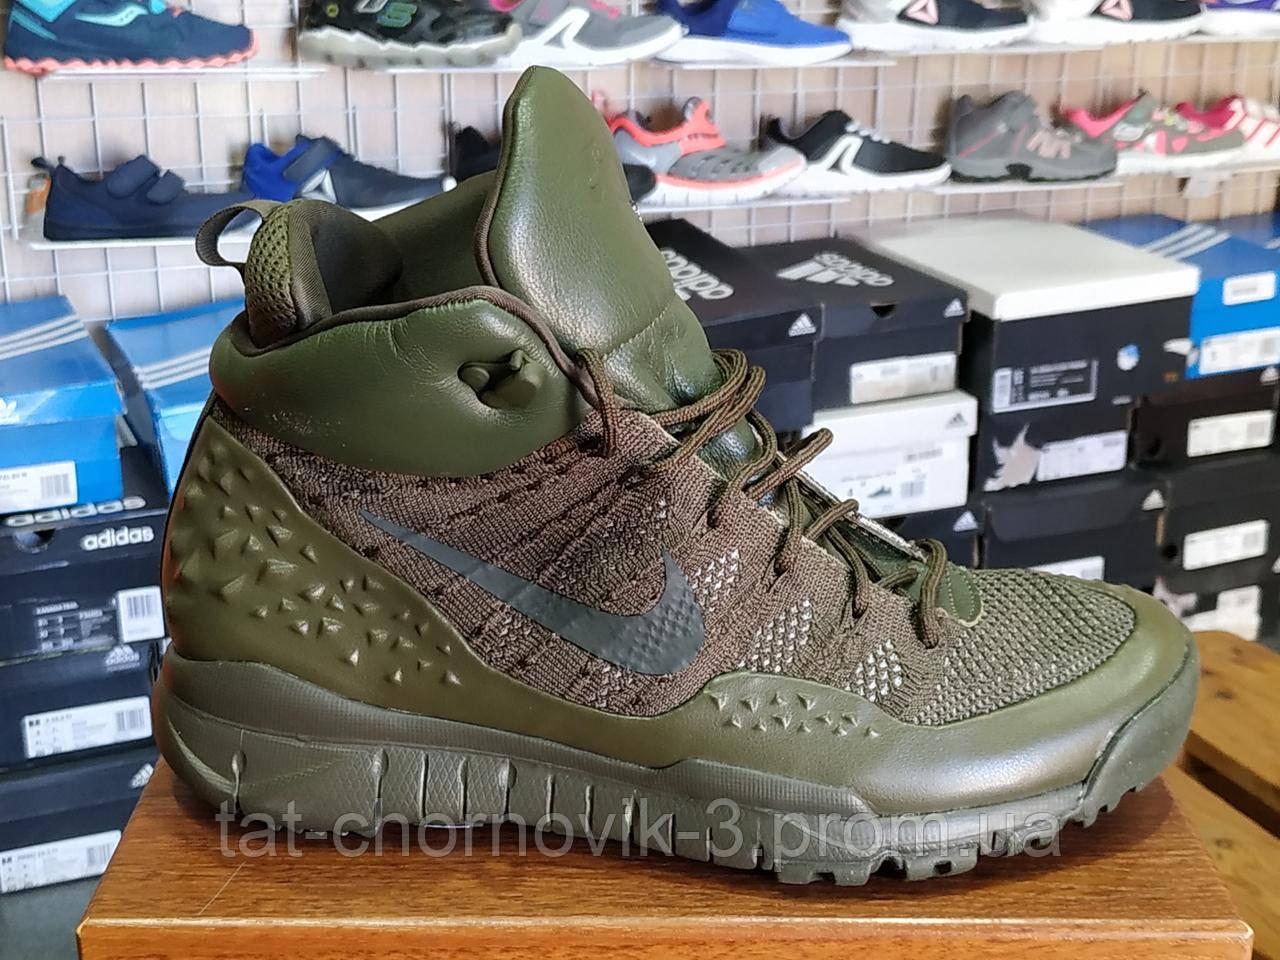 Кроссовки Nike Lupinek Flyknit (Арт.: 862505-300)